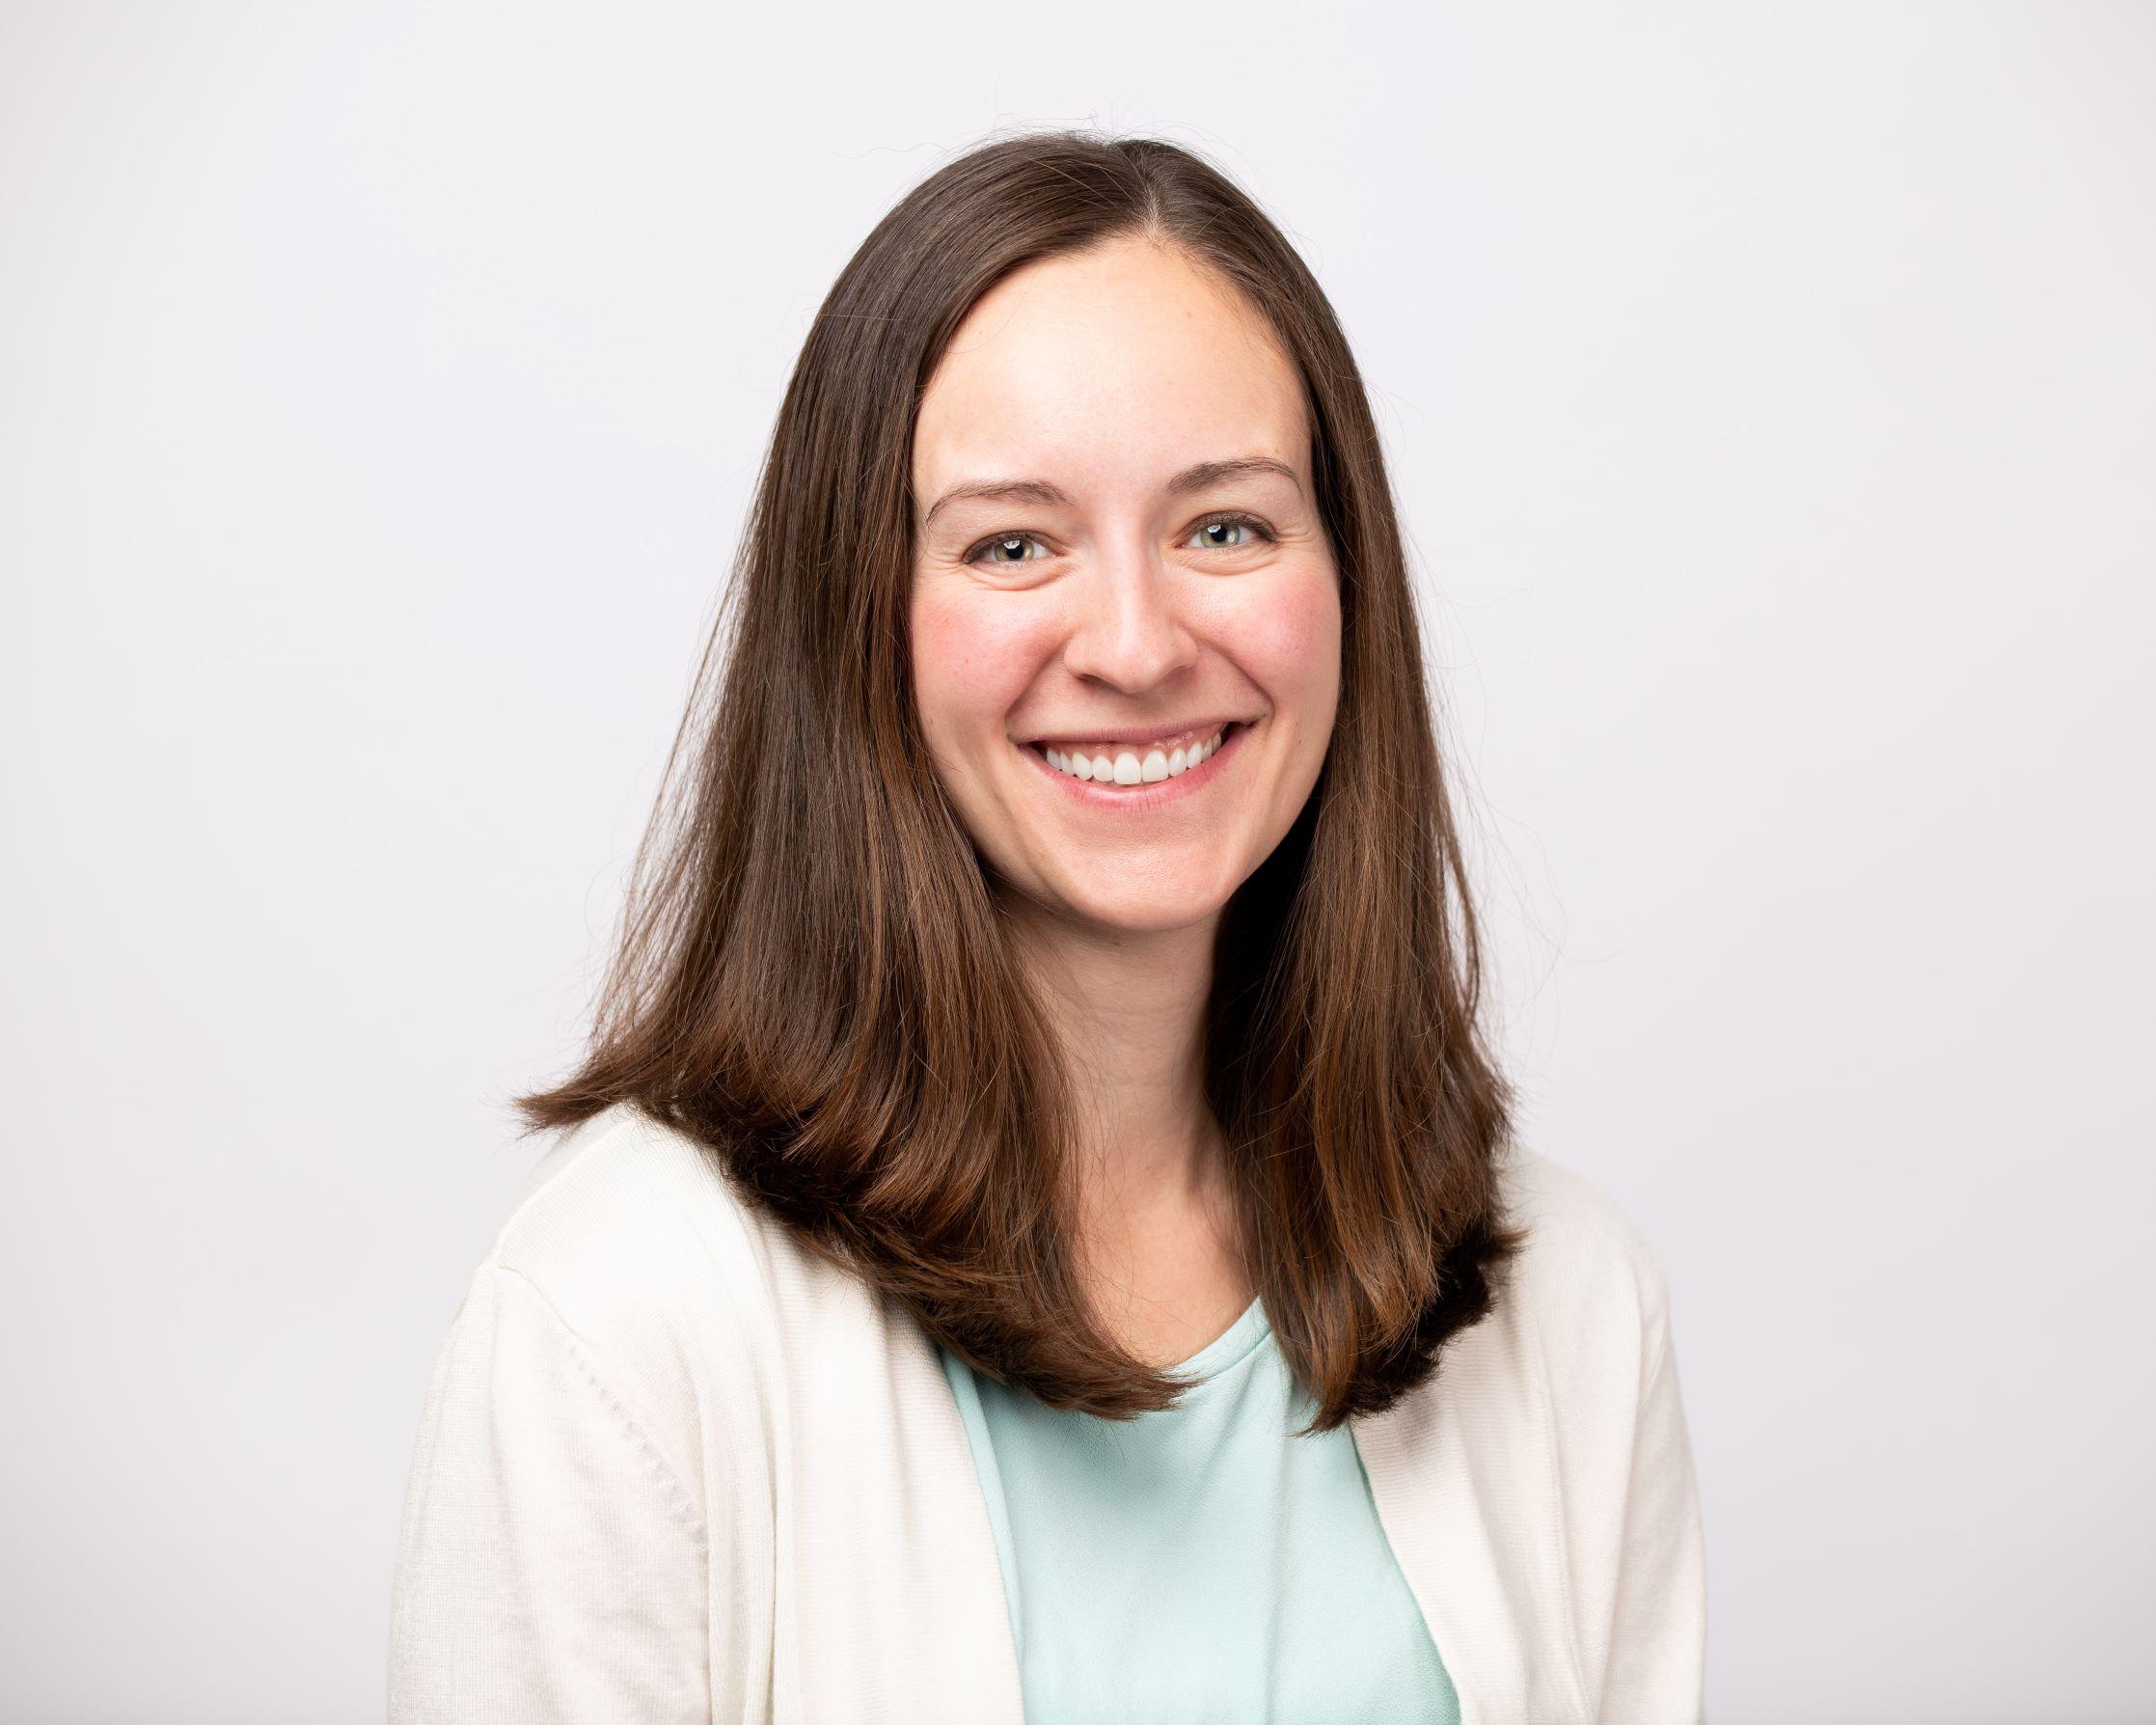 Katelyn Padgett